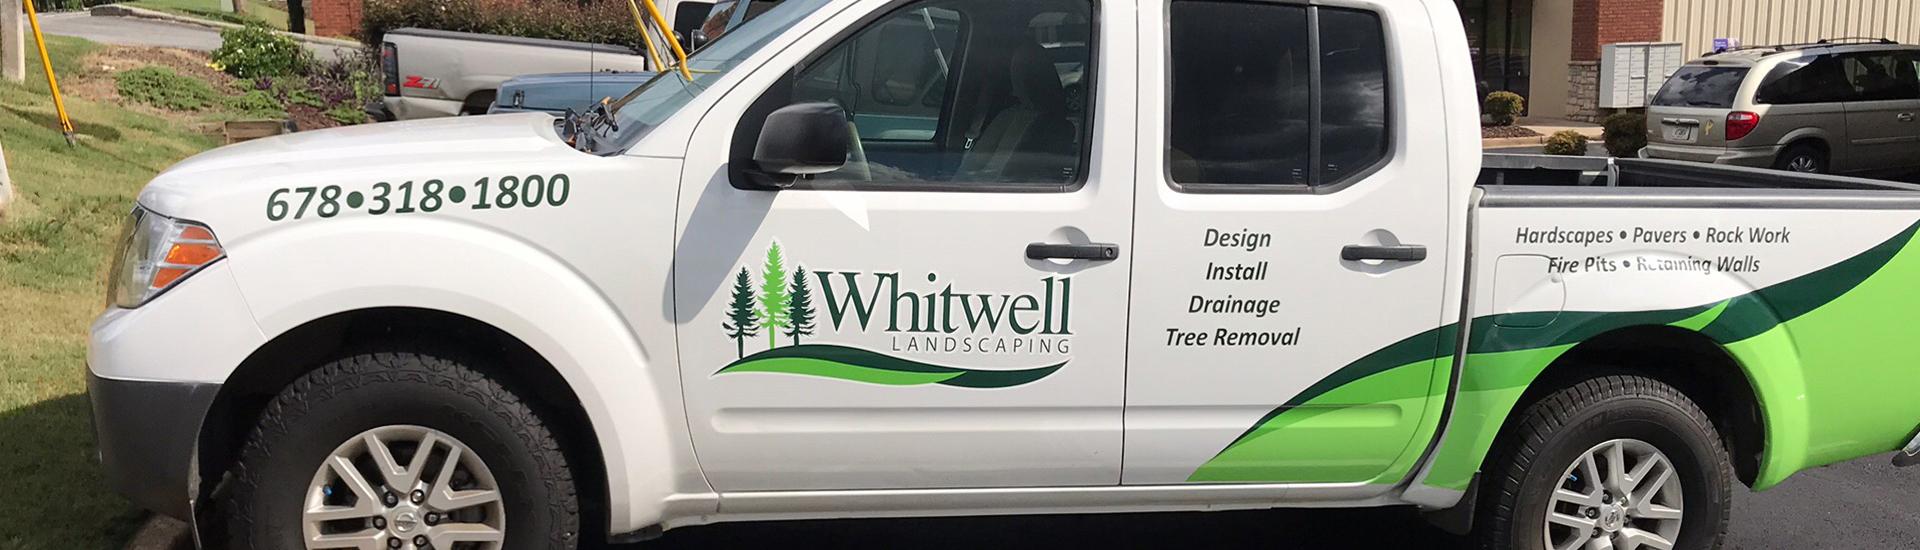 Vehicle Wraps in Suwanee, Gwinnett County, GA | North